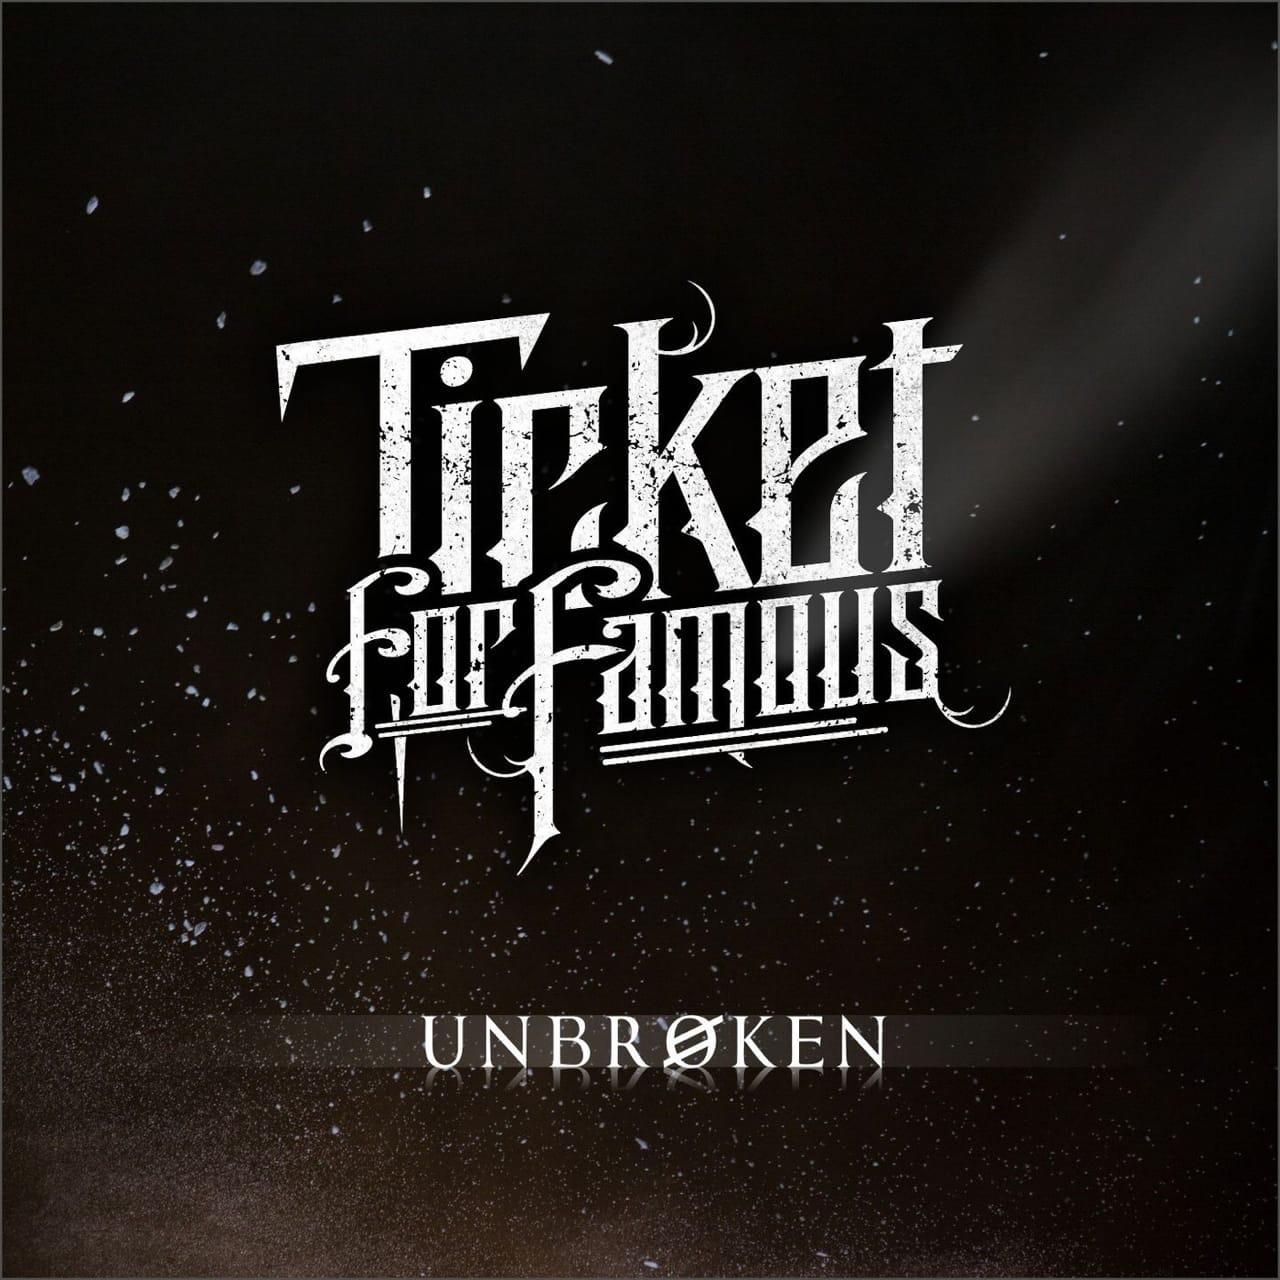 Ticket For Famous - Unbroken